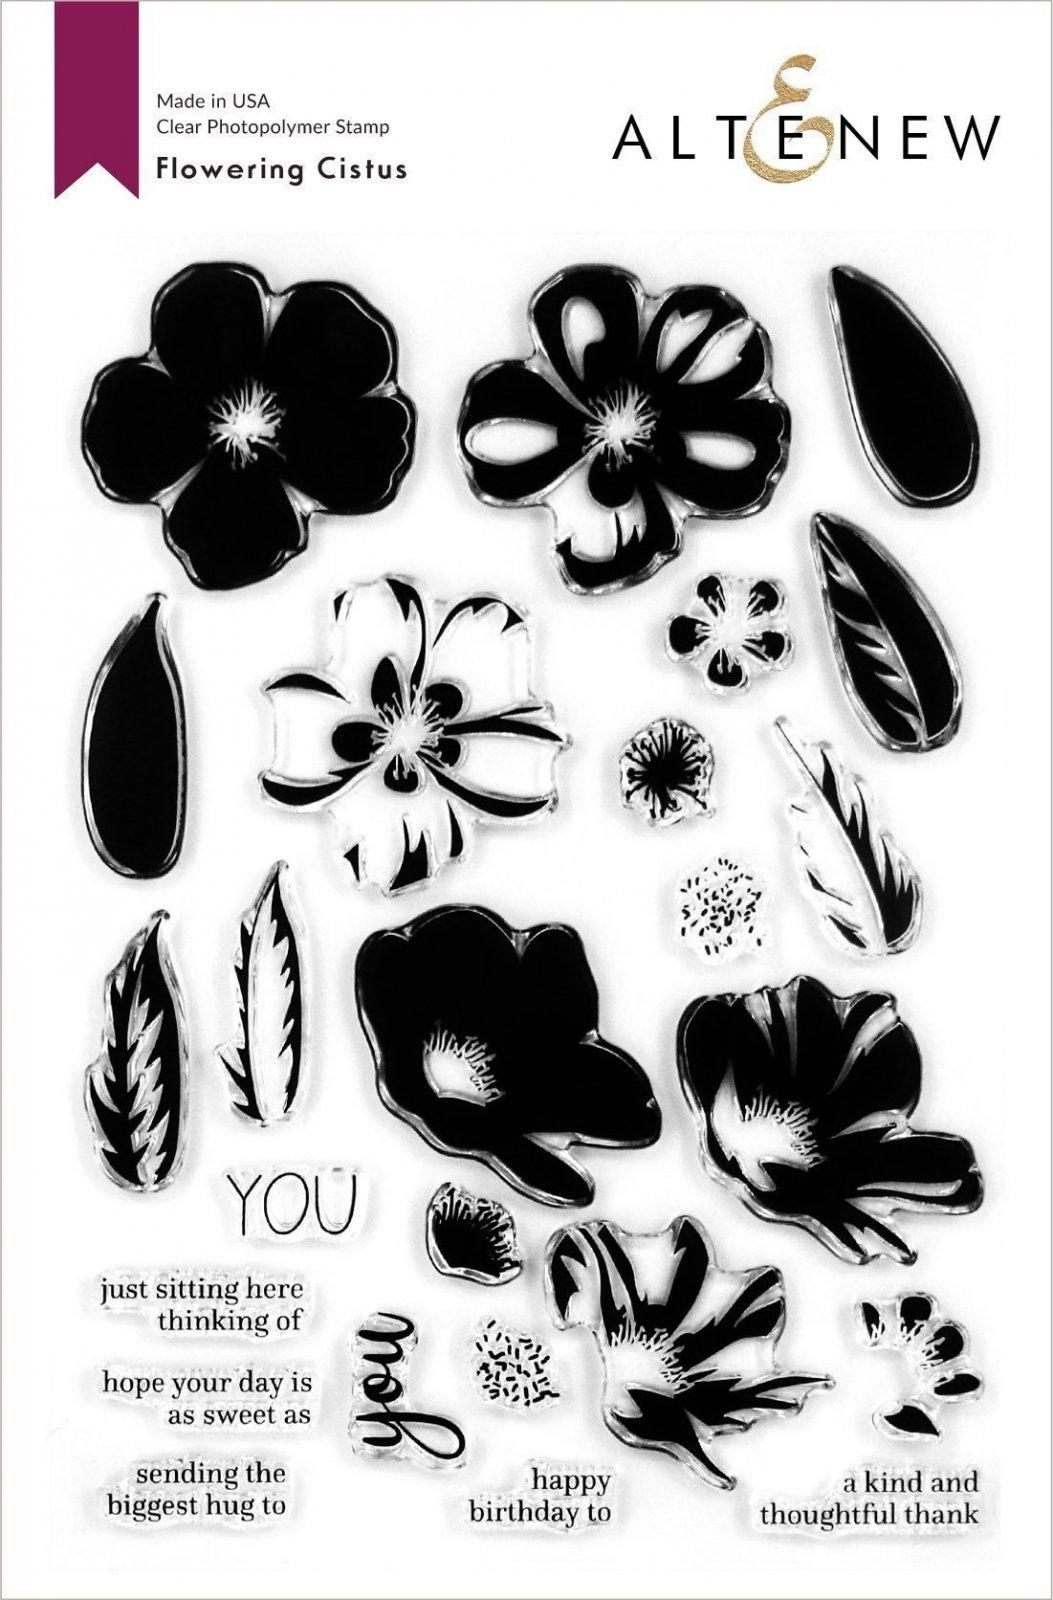 Altenew -  Clear Photopolymer Stamps -  Flowering Cistus Stamp Set